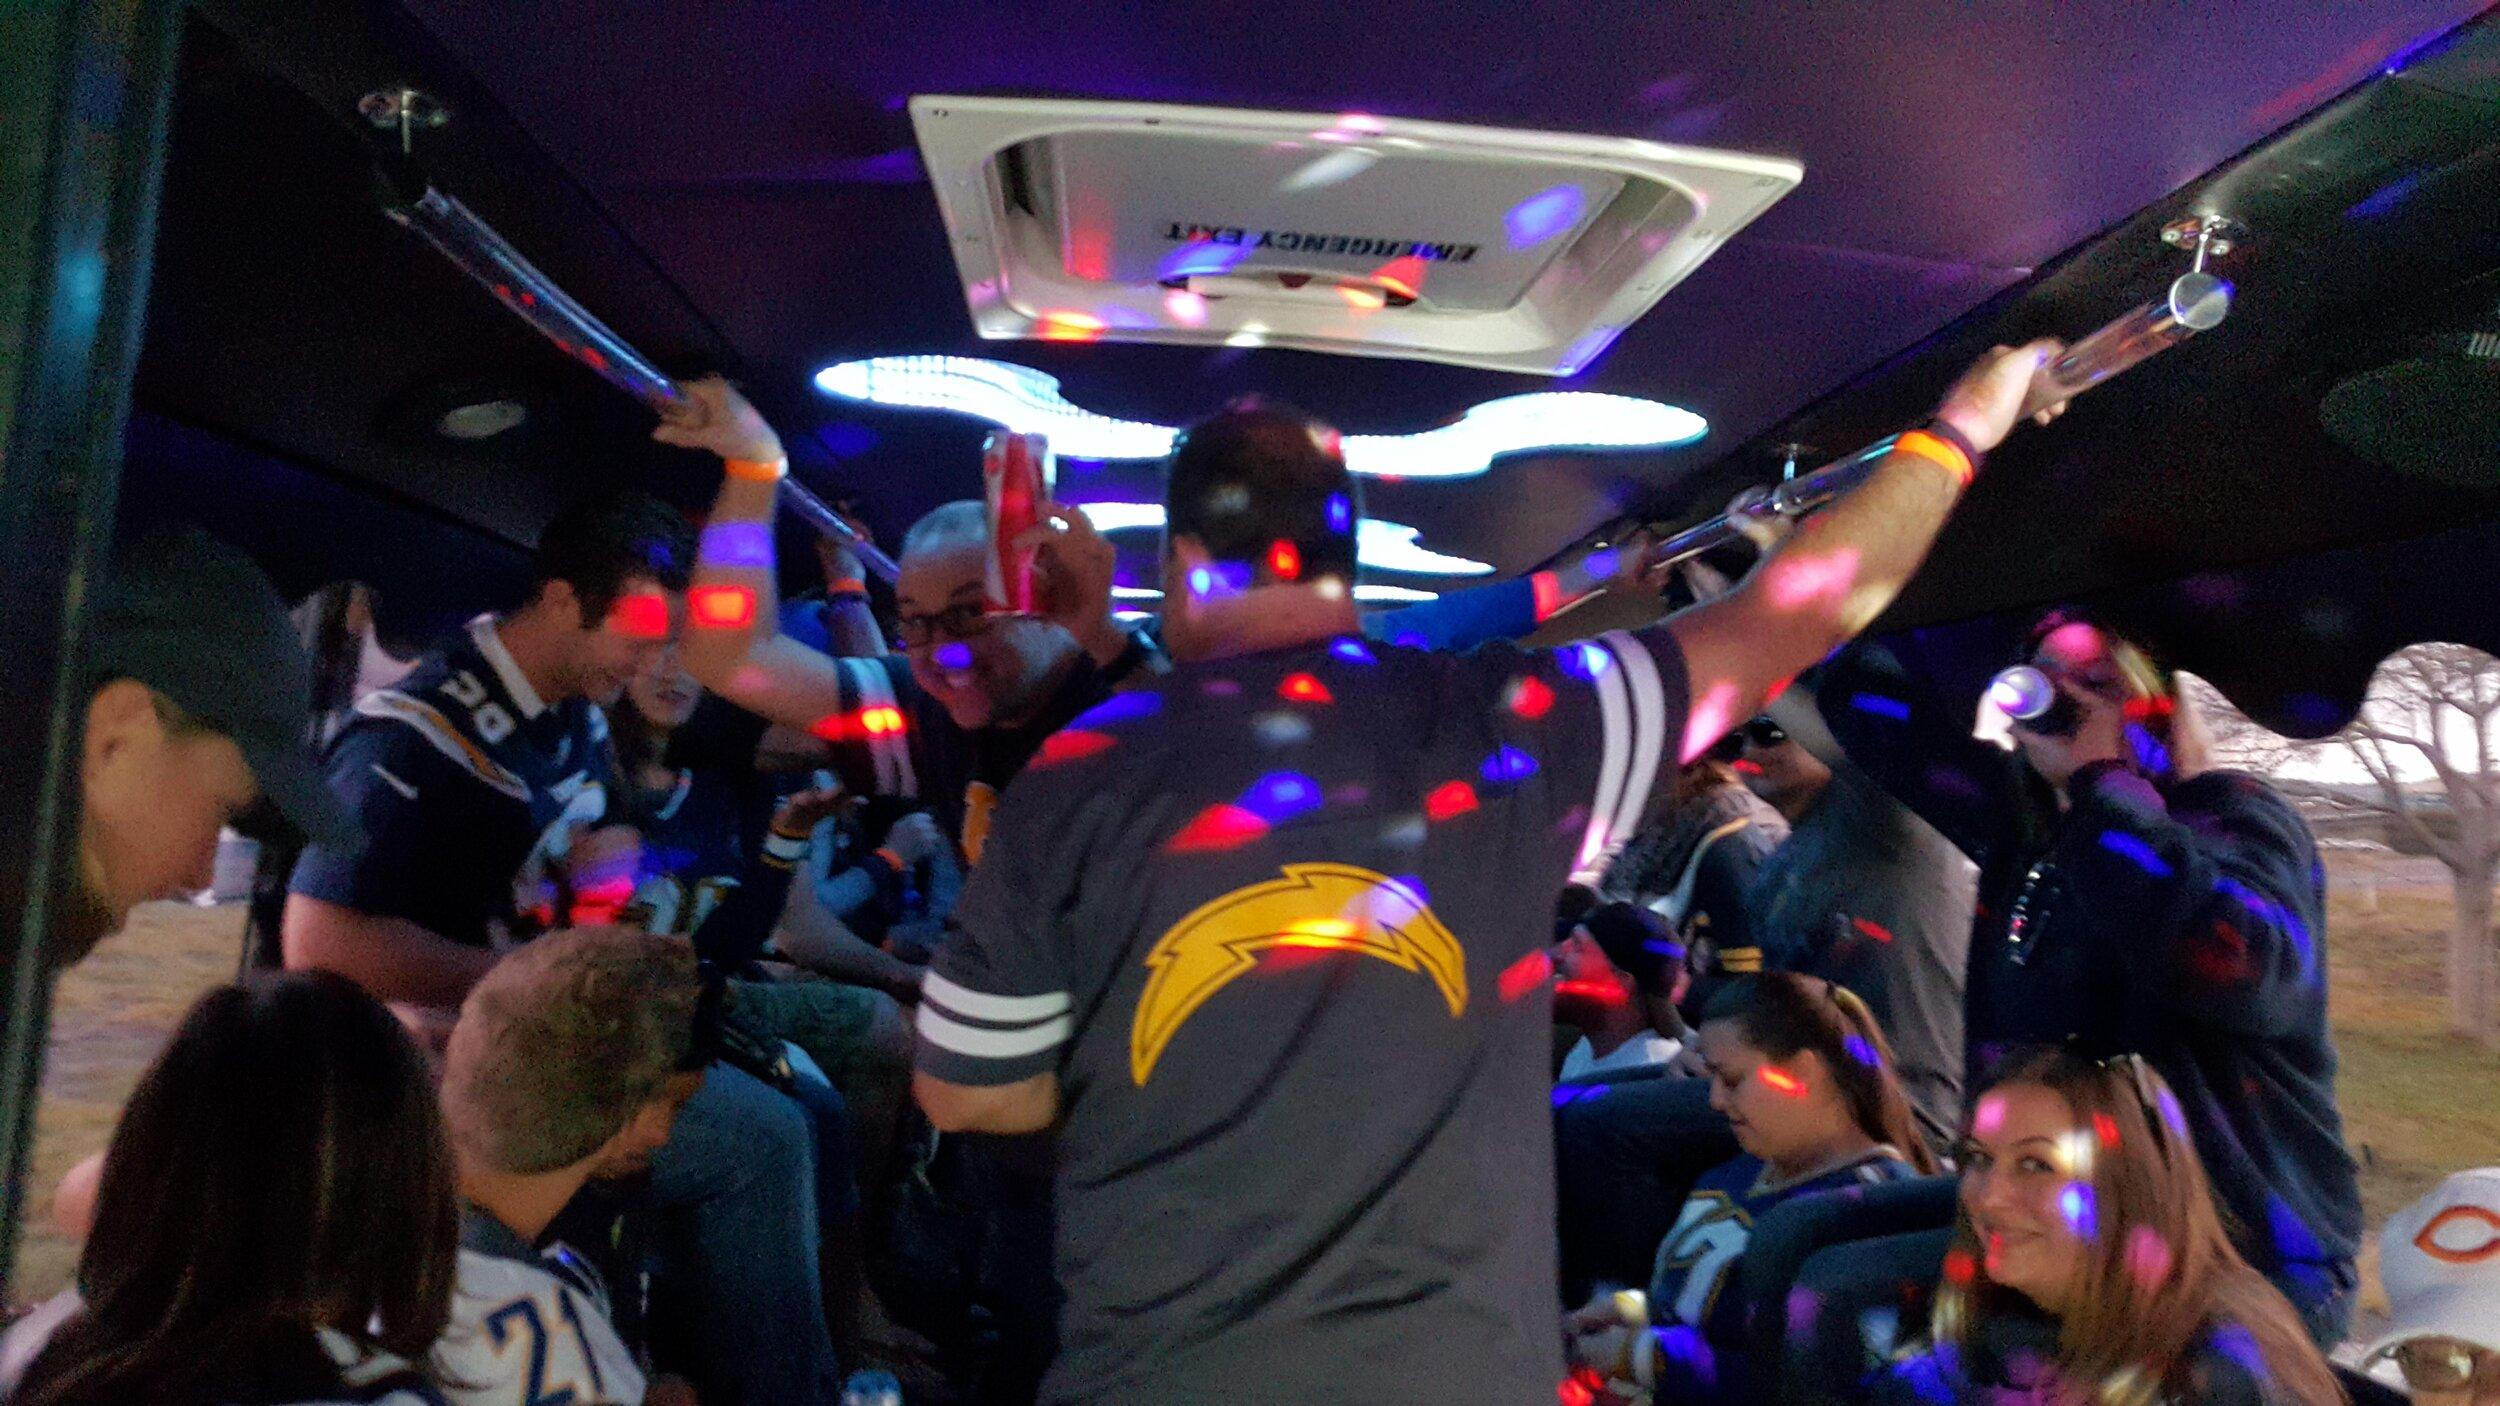 charter-bus-rental-for-barbat-mitzvahs-from-encinitas-interior-picture.jpg